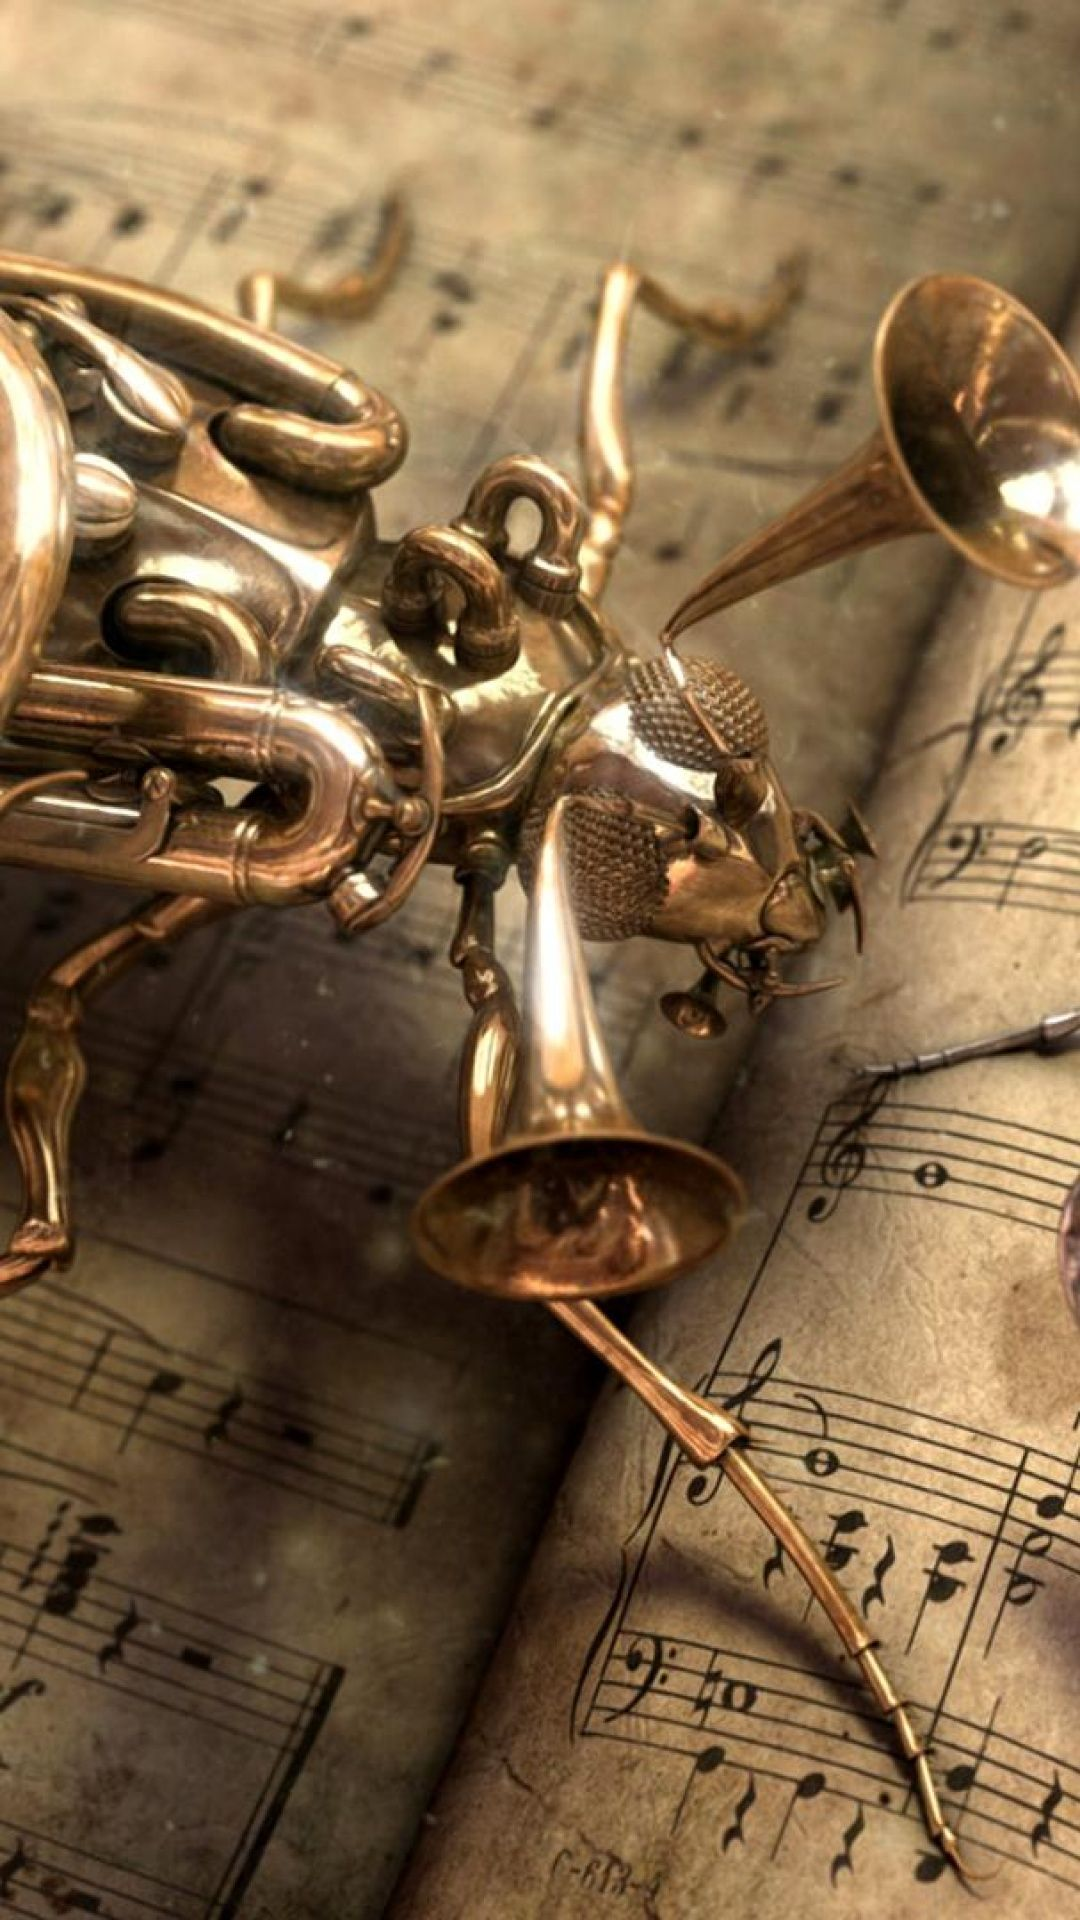 Great Wallpaper Music Steampunk - 2ab830def87438604896d7ca6b698ebf  Pic_884160.jpg